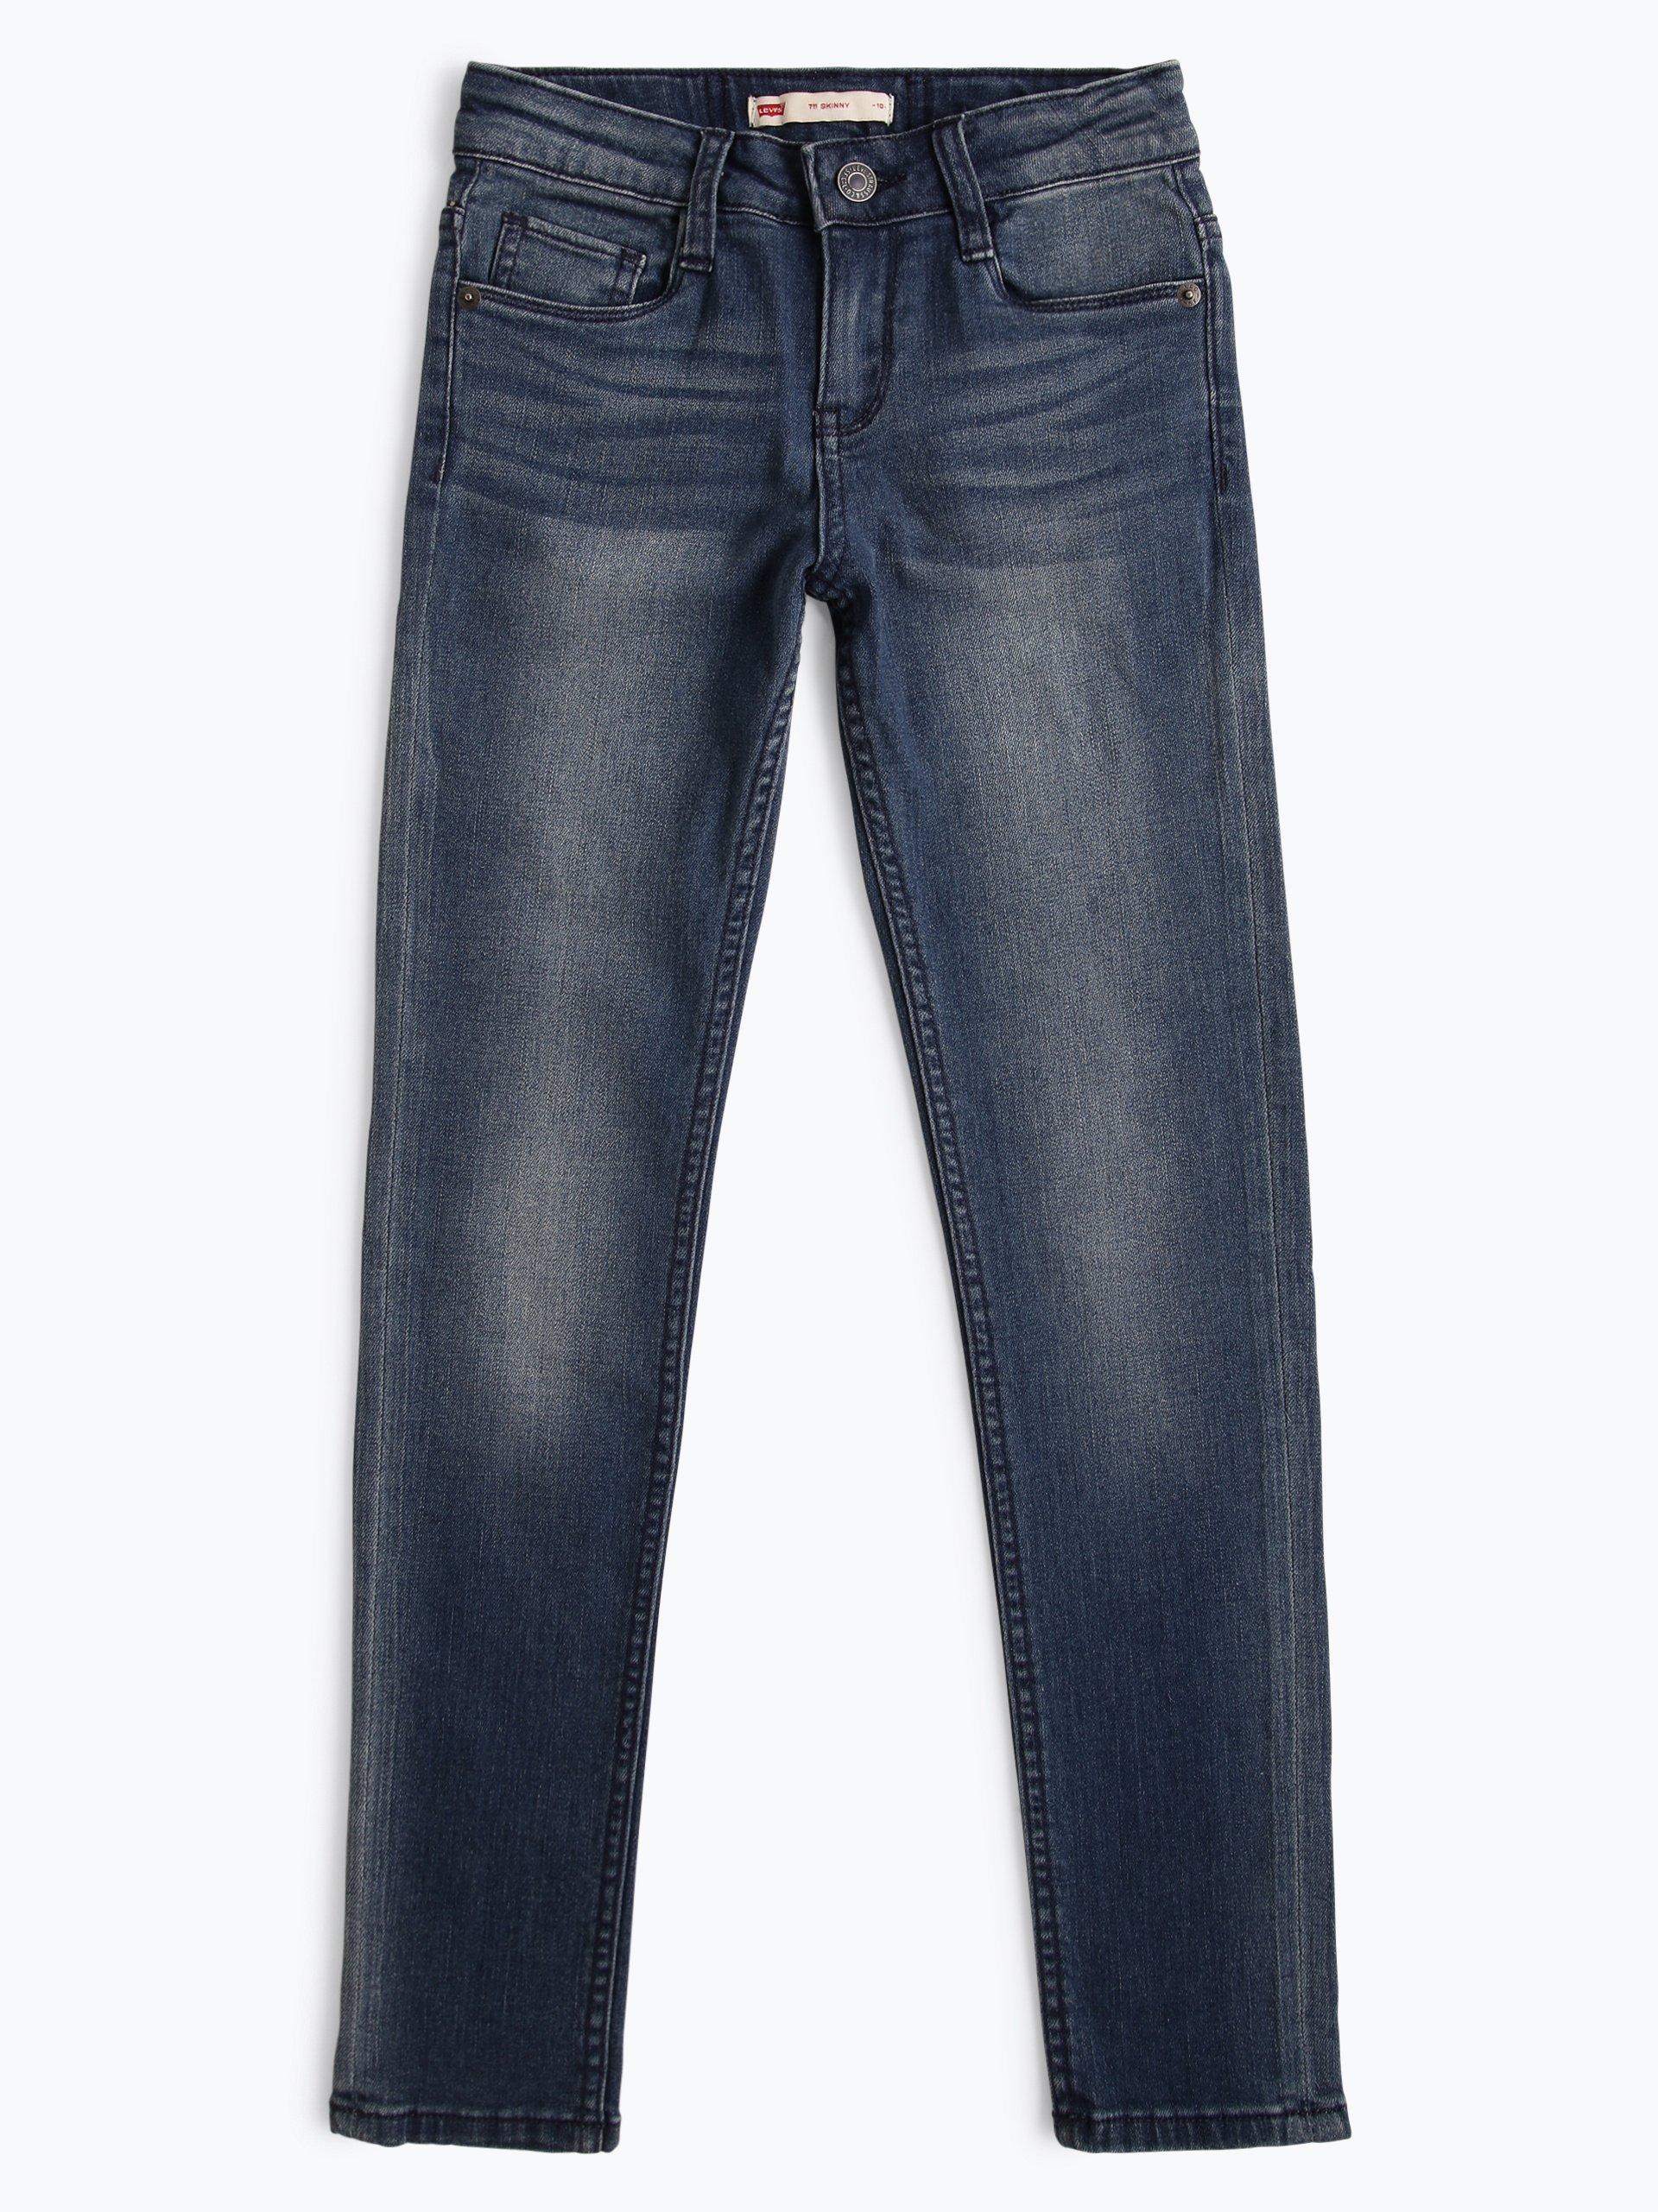 levi 39 s jungen jeans skinny fit 711 indigo uni online kaufen peek und cloppenburg de. Black Bedroom Furniture Sets. Home Design Ideas